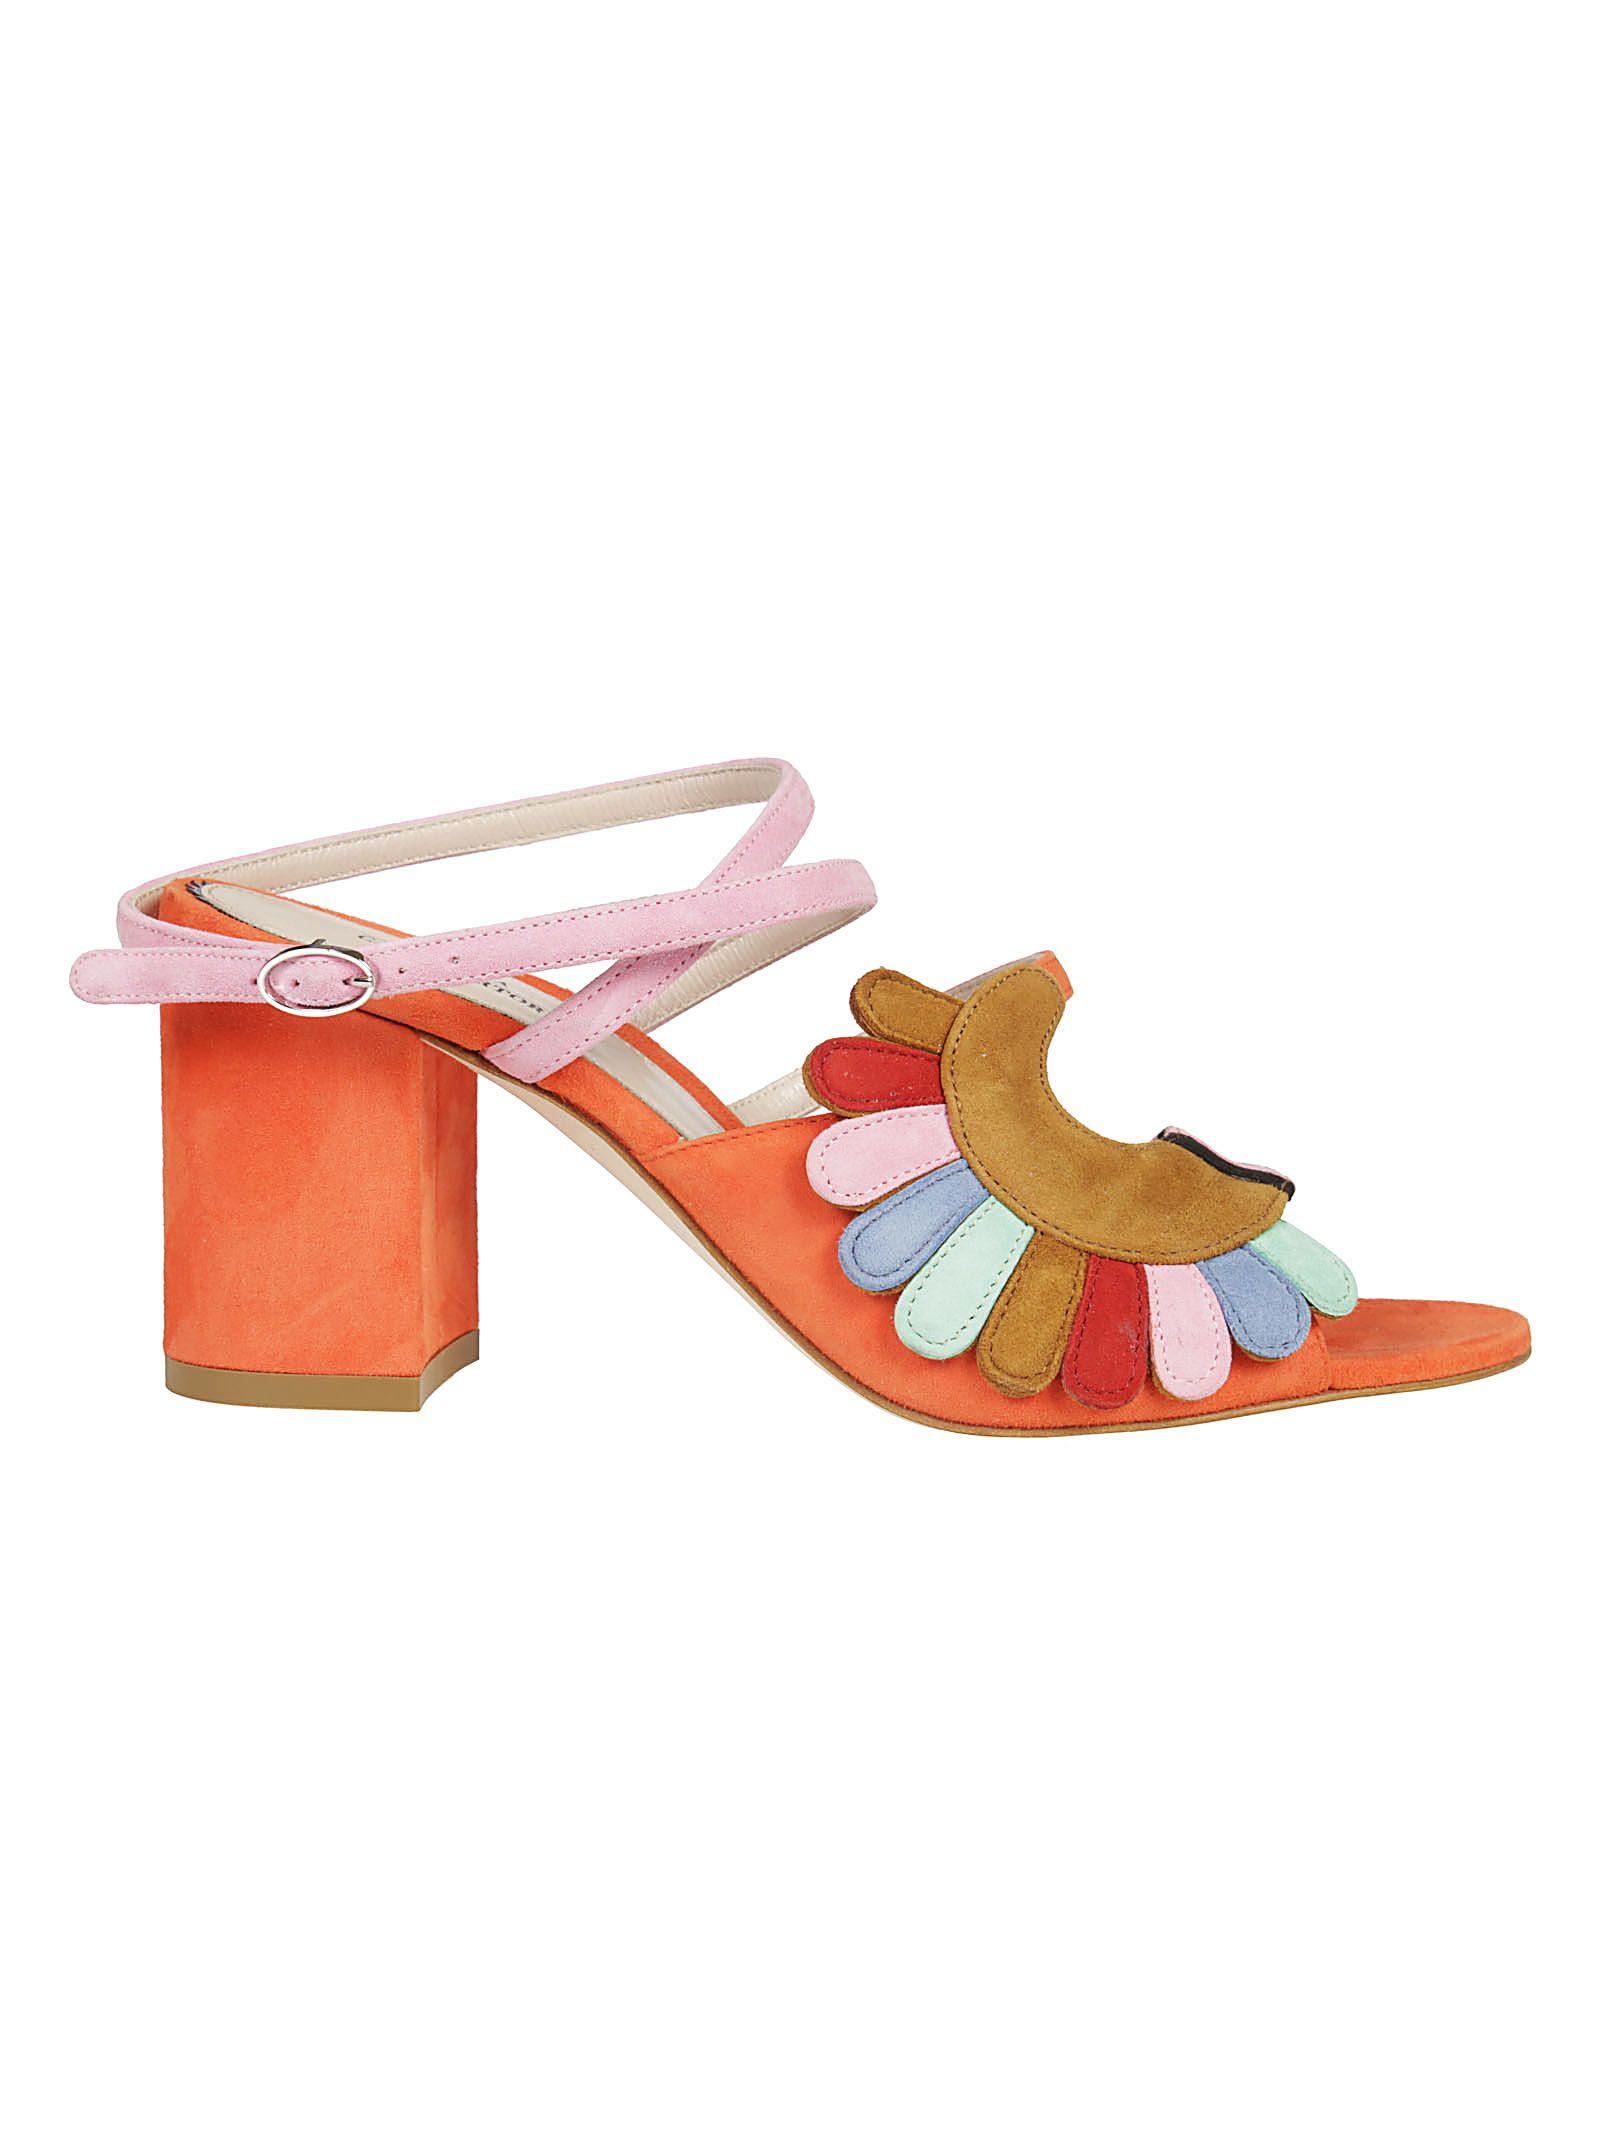 PAULA CADEMARTORI Classic Sandals Clearance Top Quality Sale Pictures zNXsais